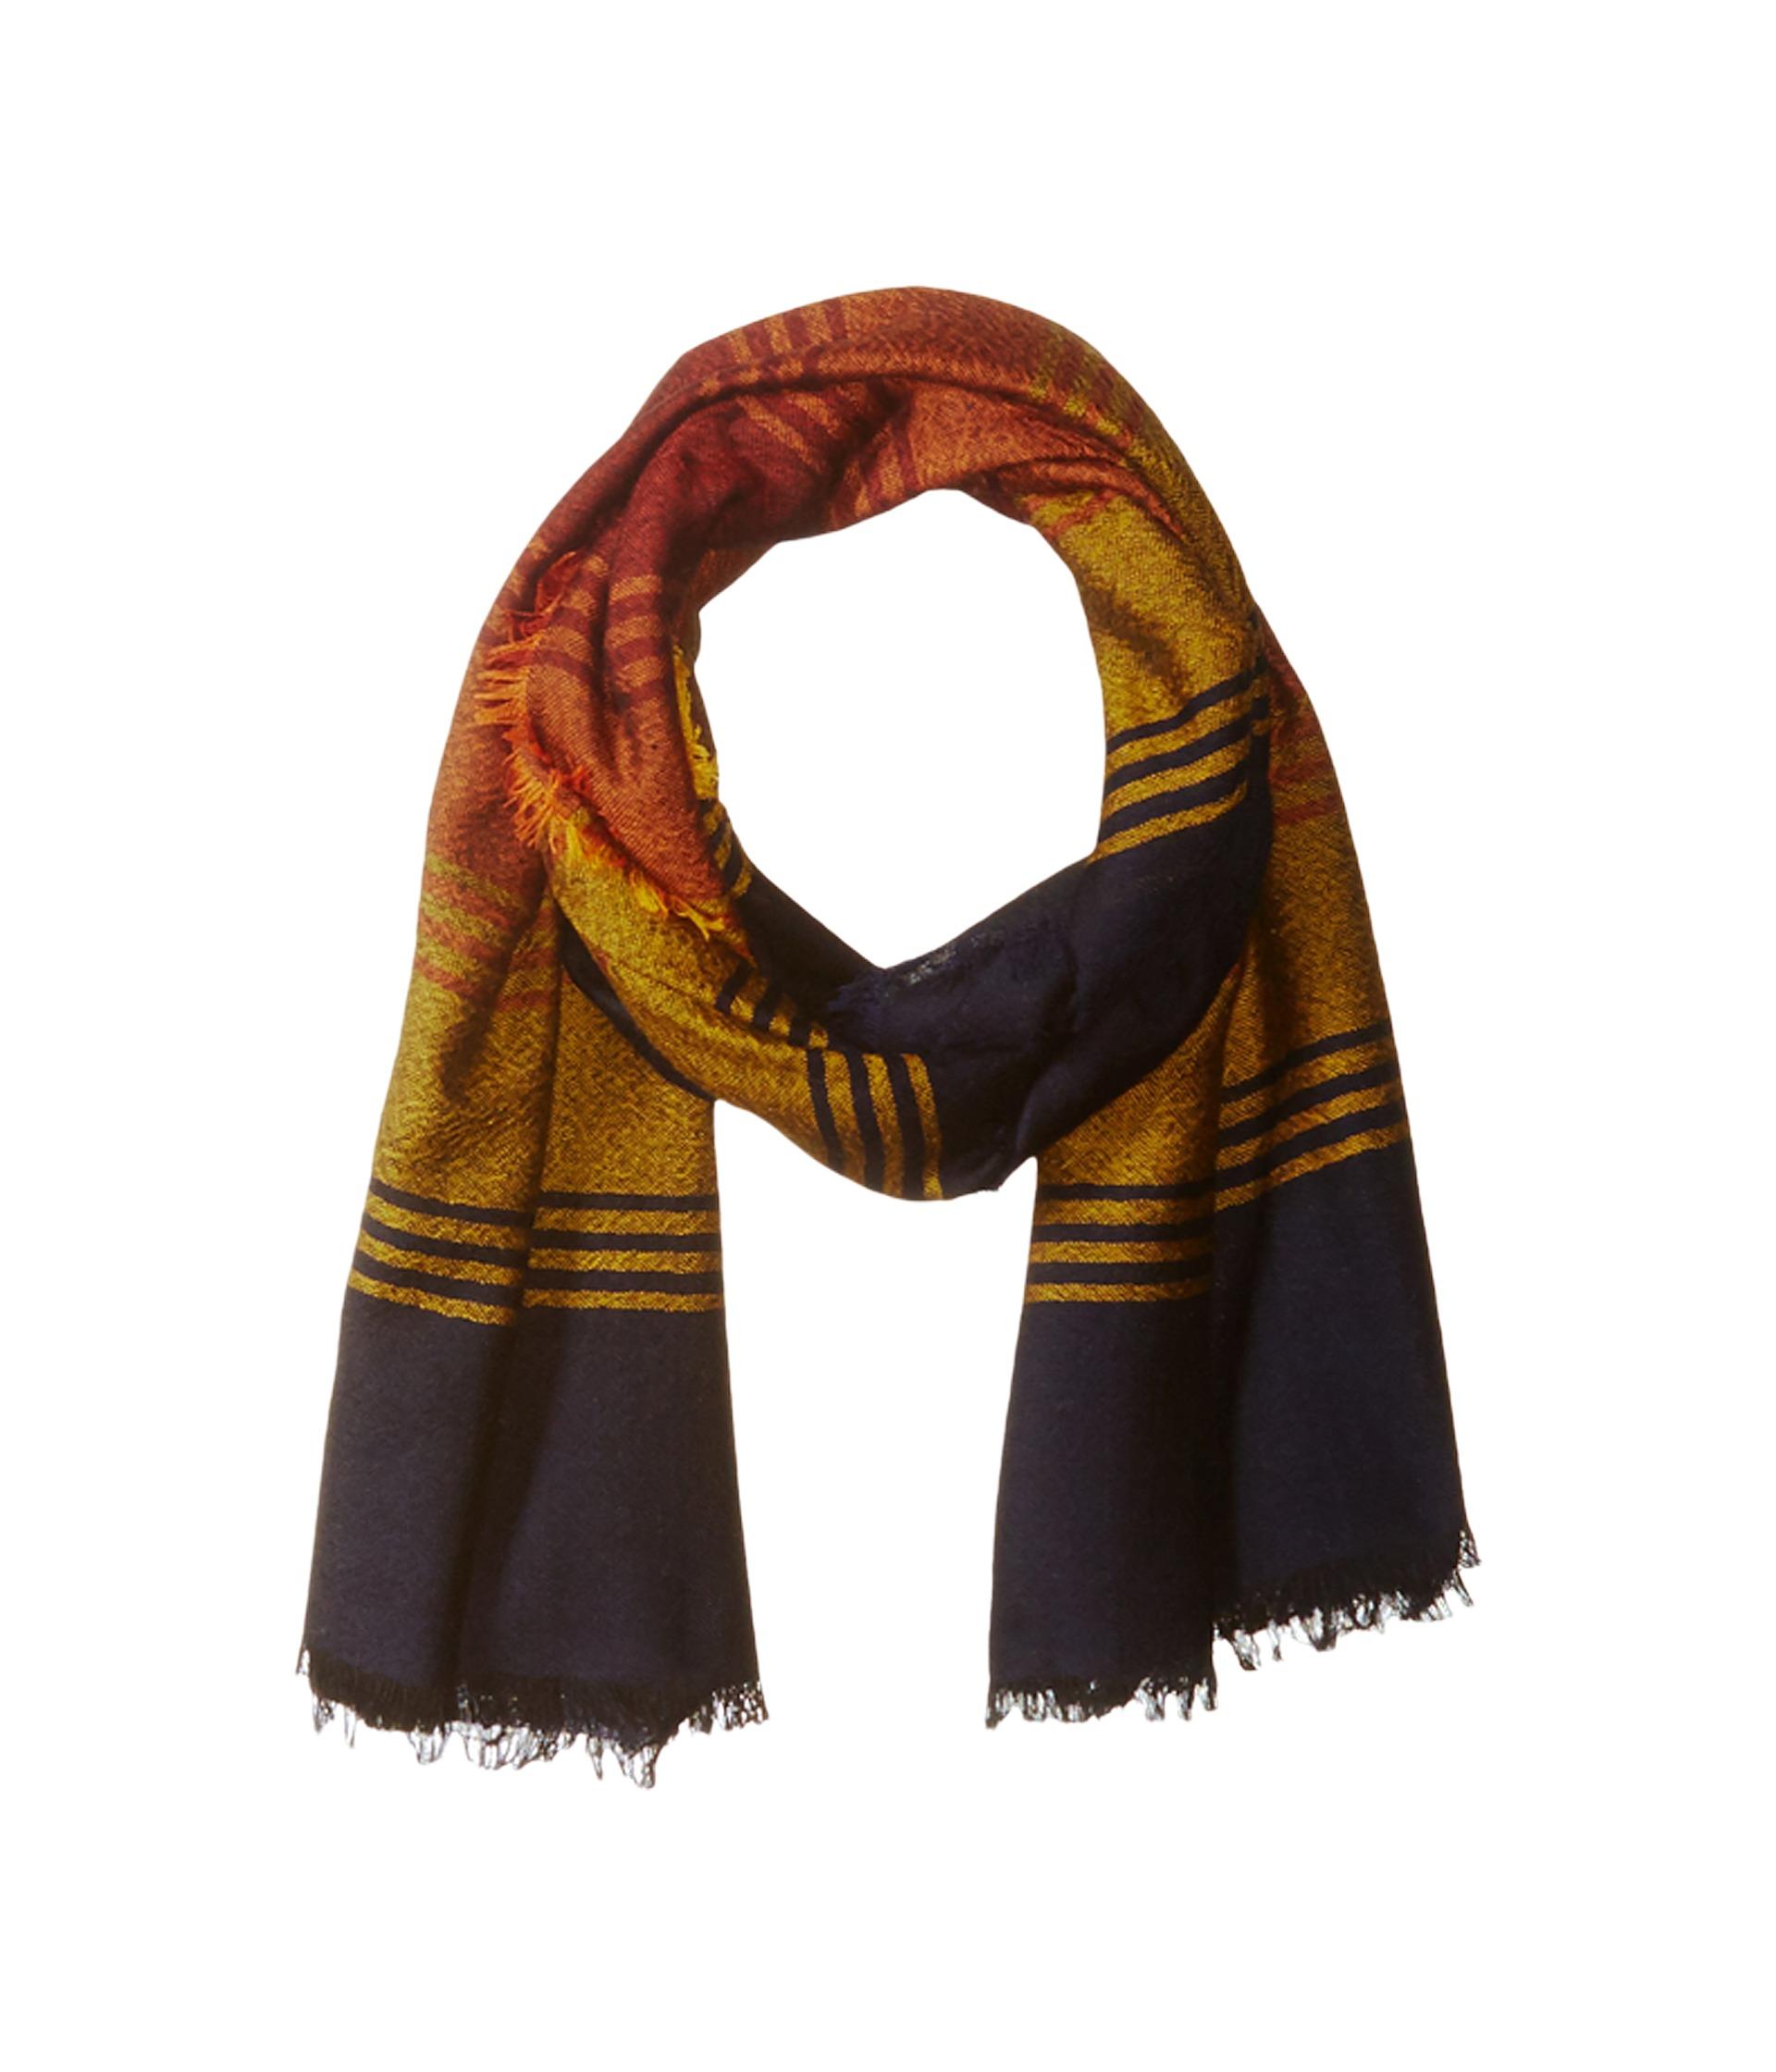 abbdf8a7c Pendleton Stripe Featherweight Wool Scarf in Brown - Lyst